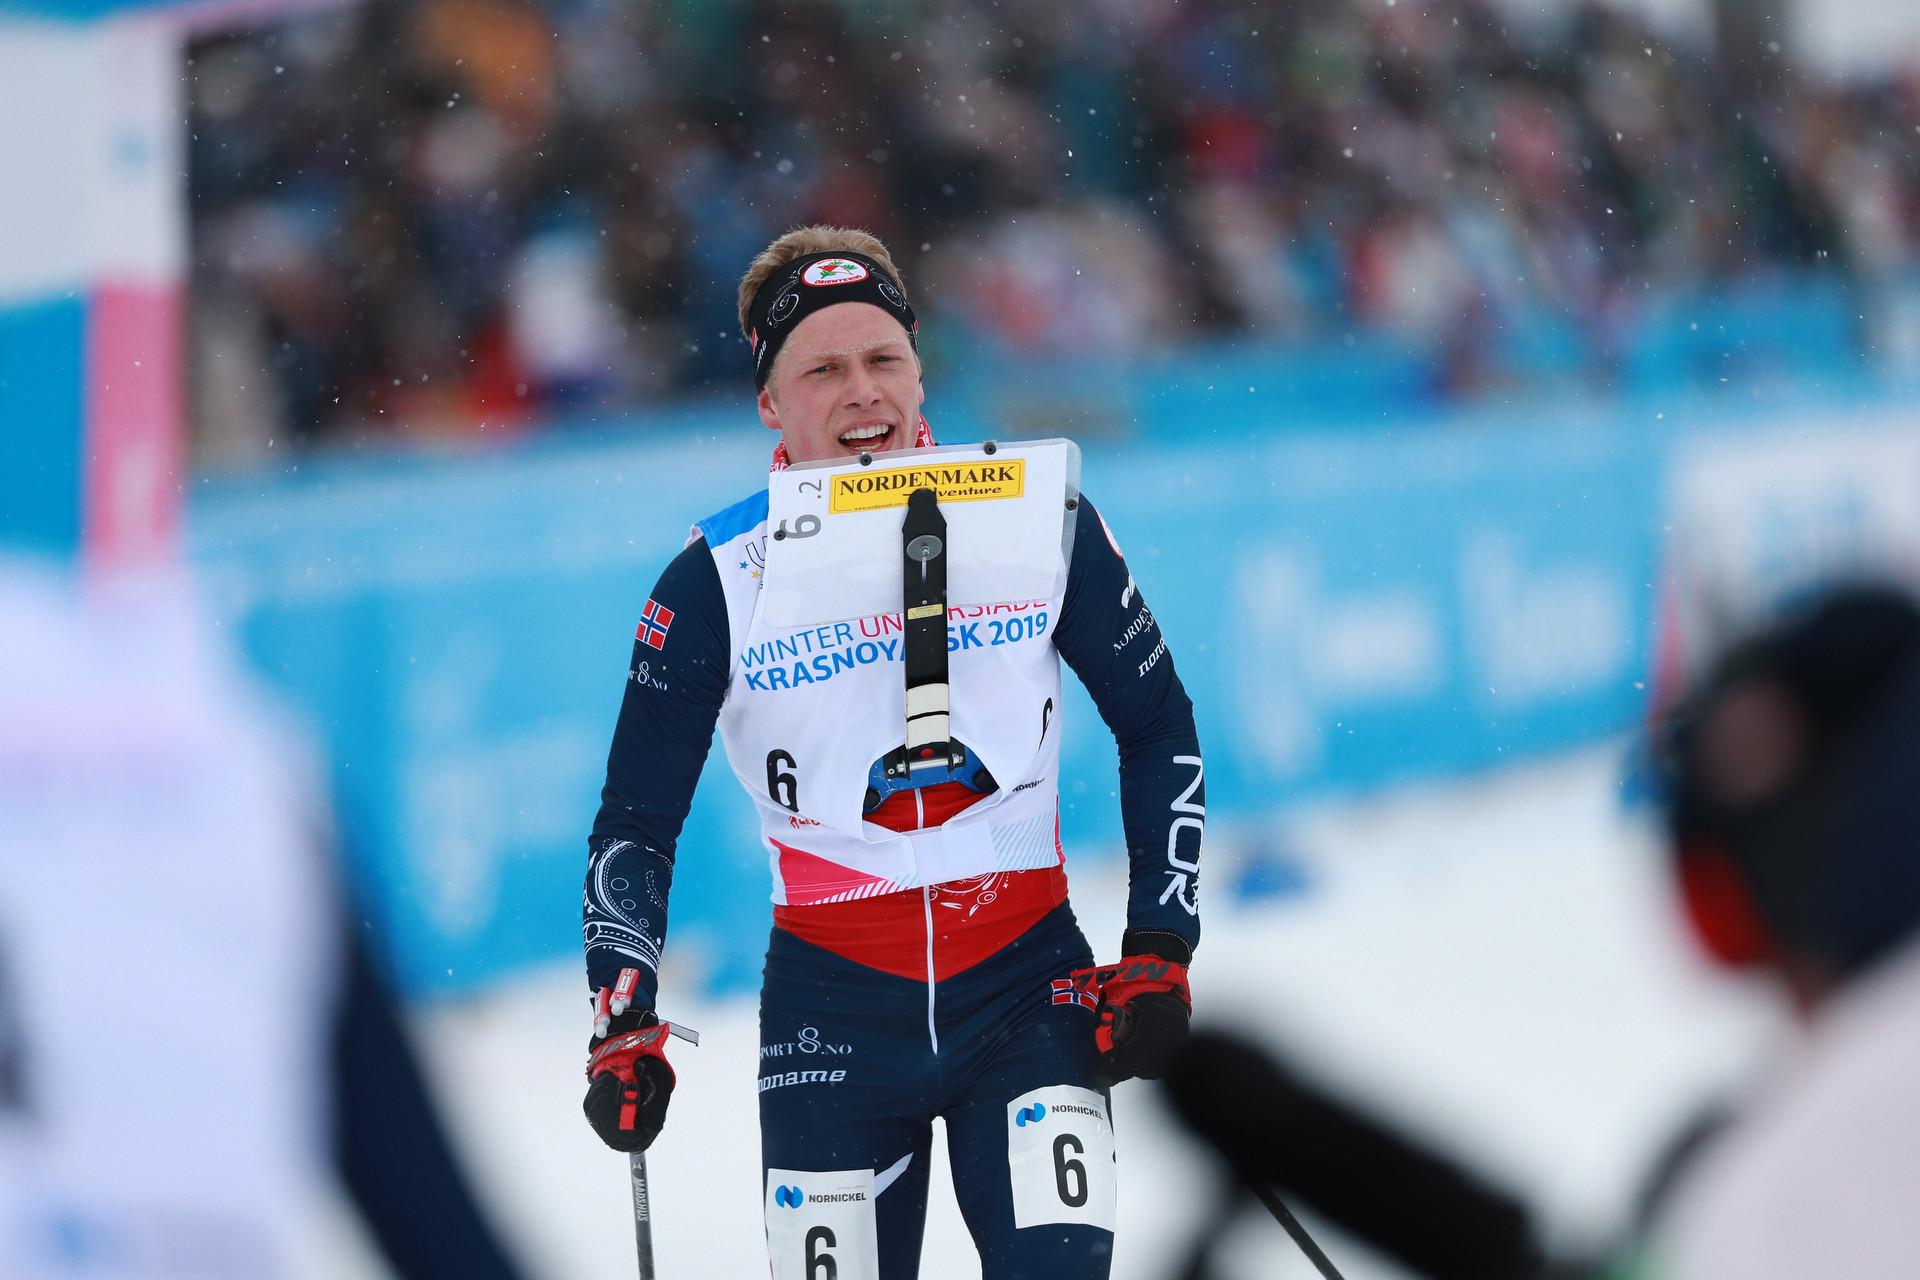 The final ski orienteering event of the Universiade took place at the Raduga Cluster ©Krasnoyarsk 2019